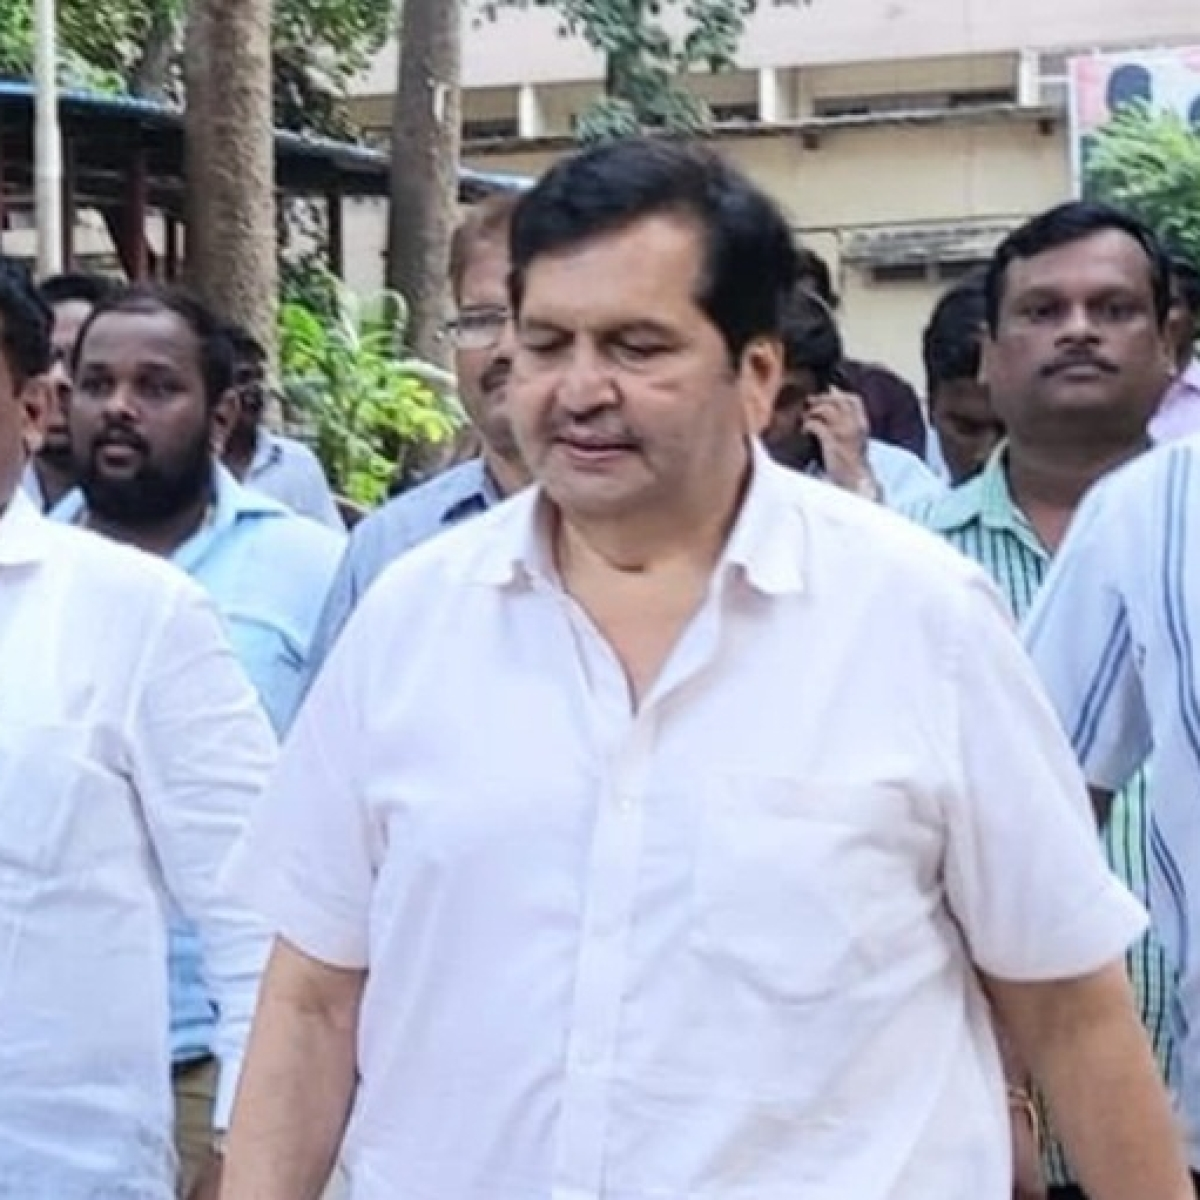 Mumbai BJP chief Mangal Prabhat Lodha refers to 1993 blasts during campaign